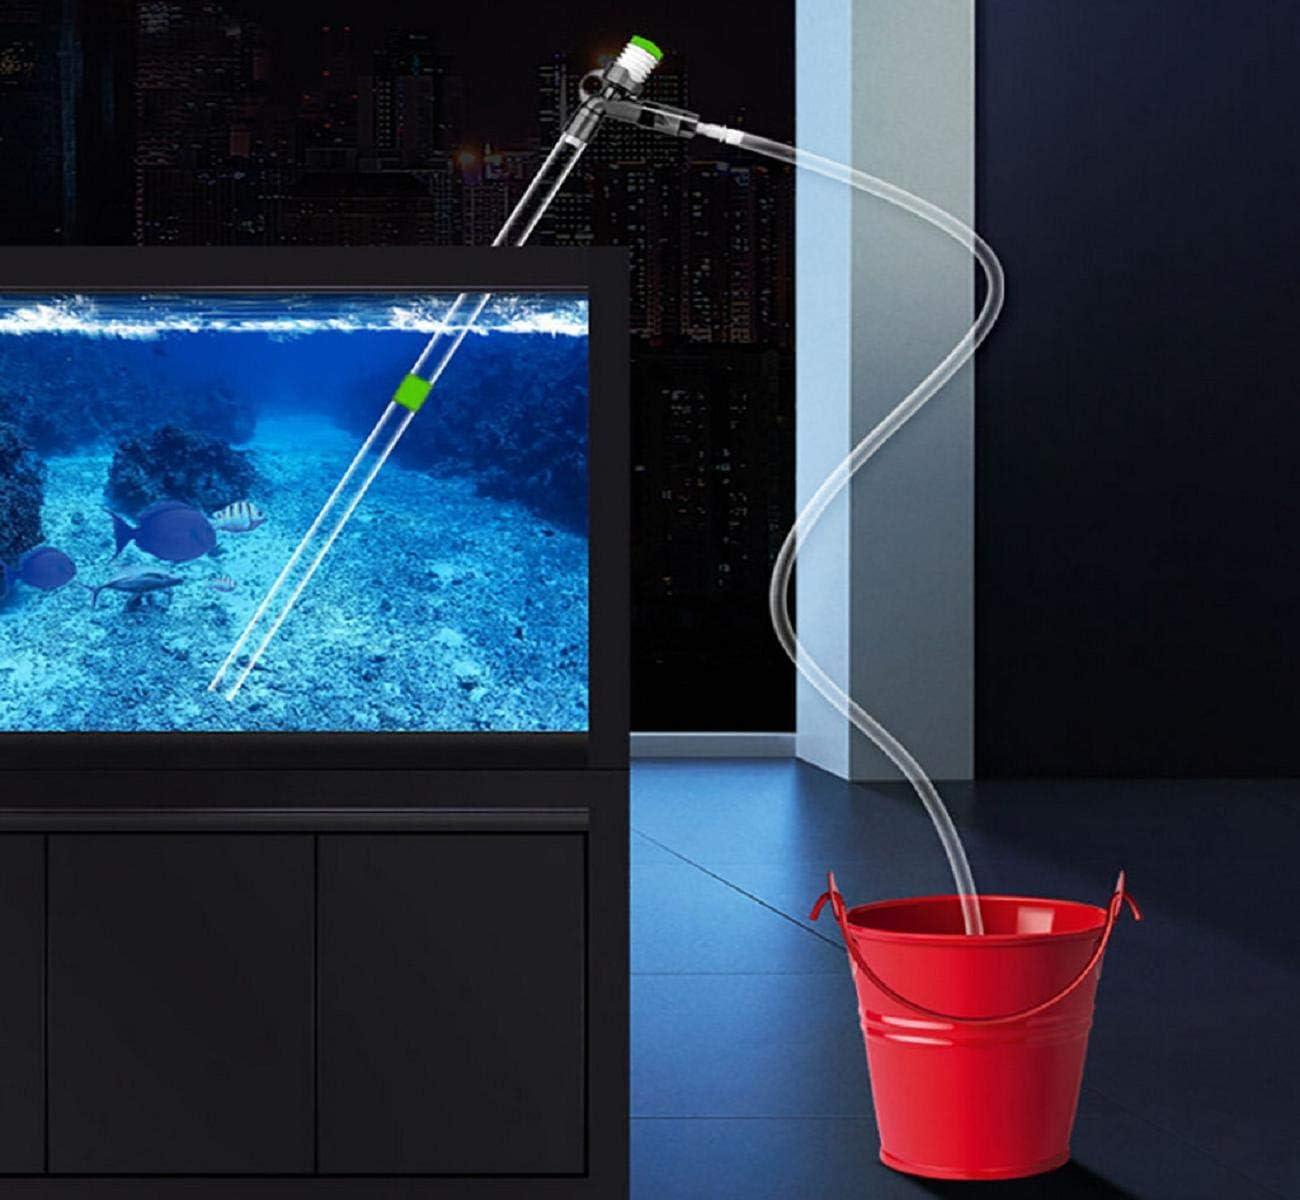 Koojawind Amortiguador de Agua para Acuario, Aspirador de sifón ...